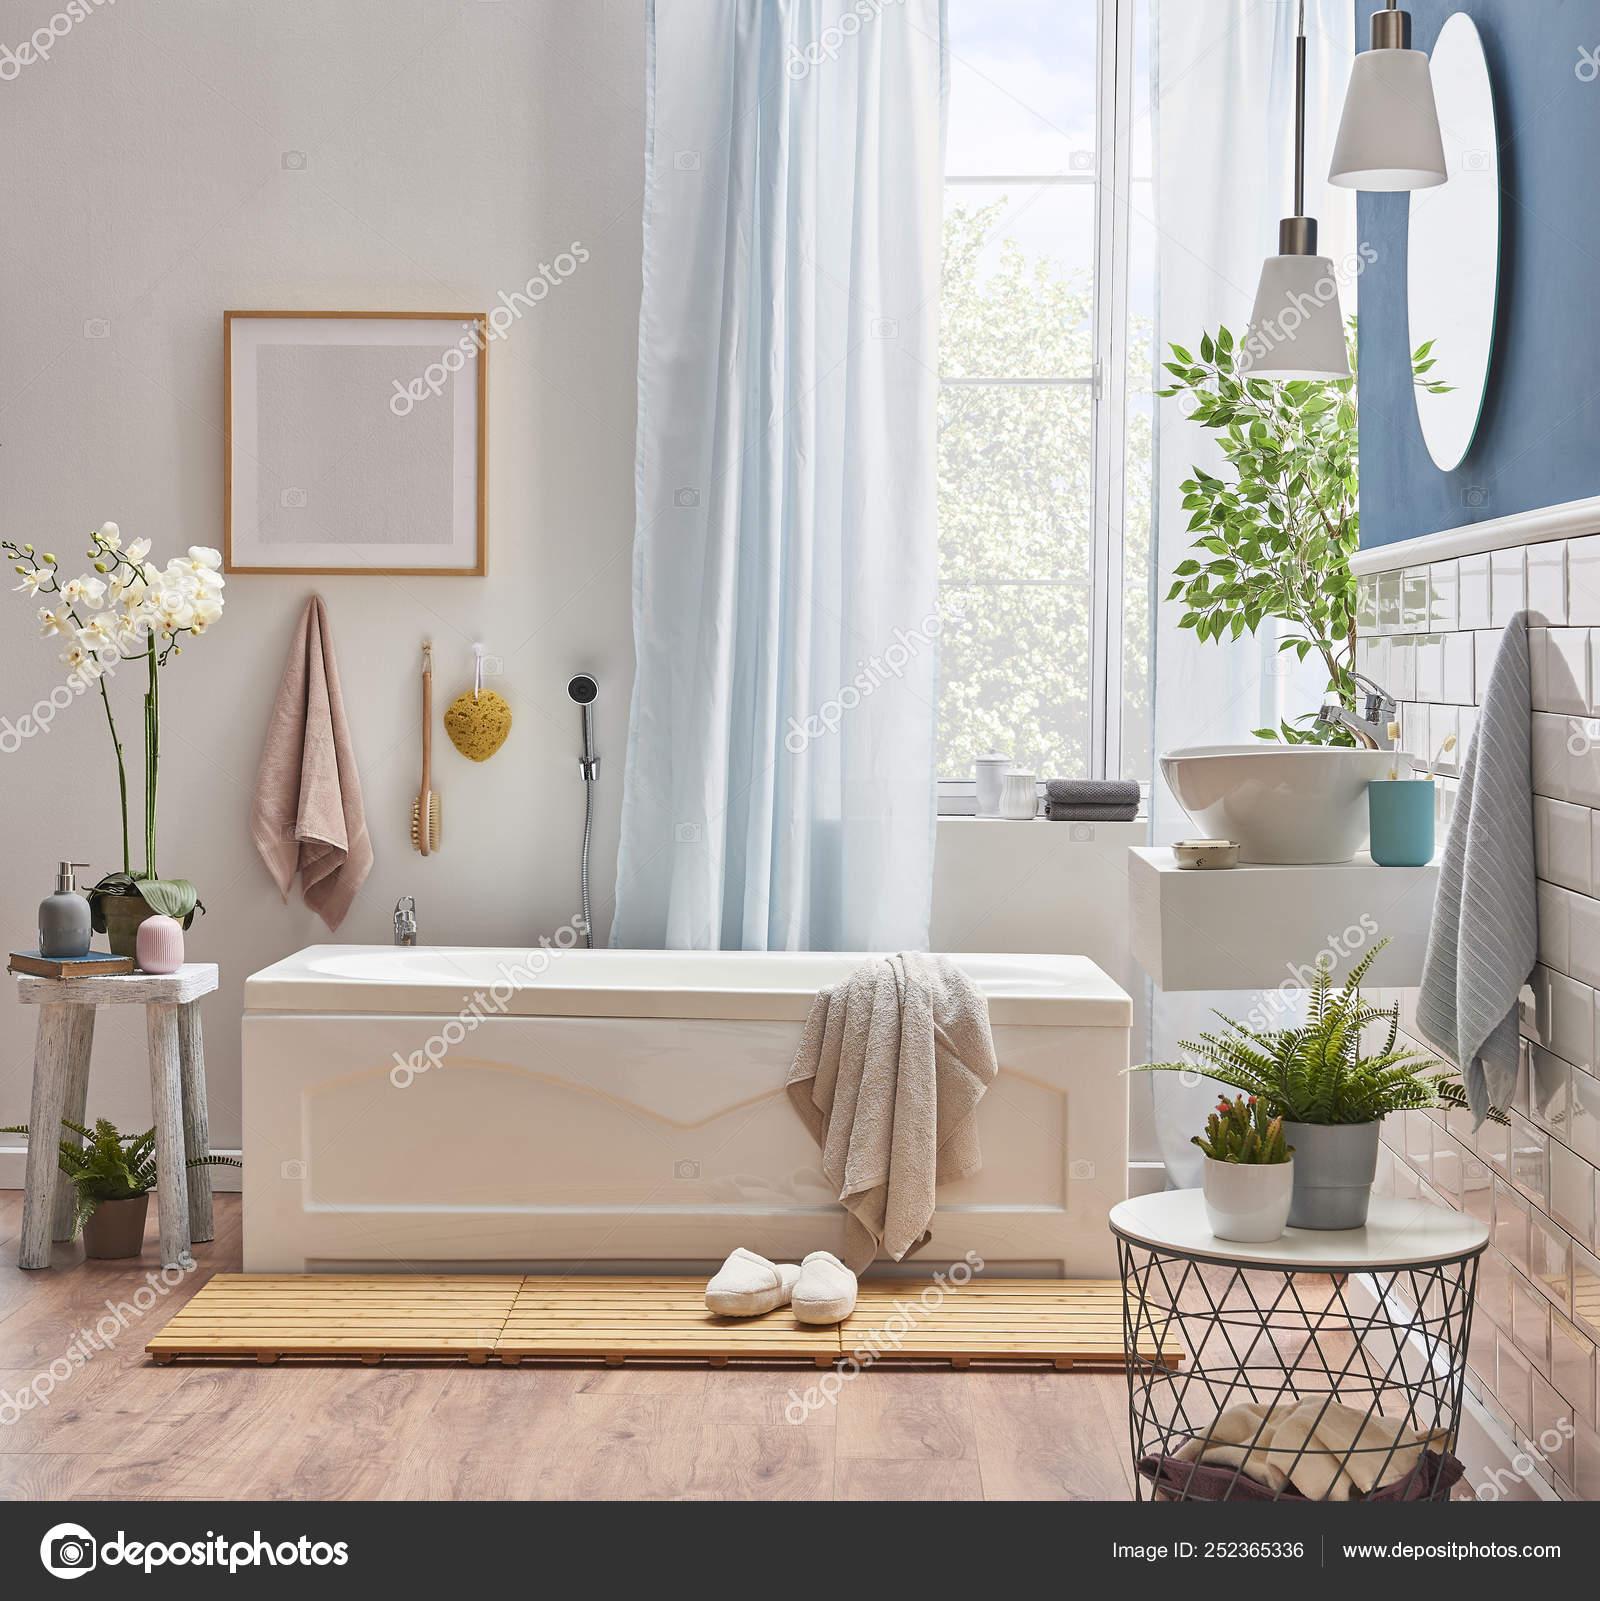 White Blue Wall Decoration White Ceramic Sink Style Bath Room Stock Photo C Unitedphotostudio 252365336